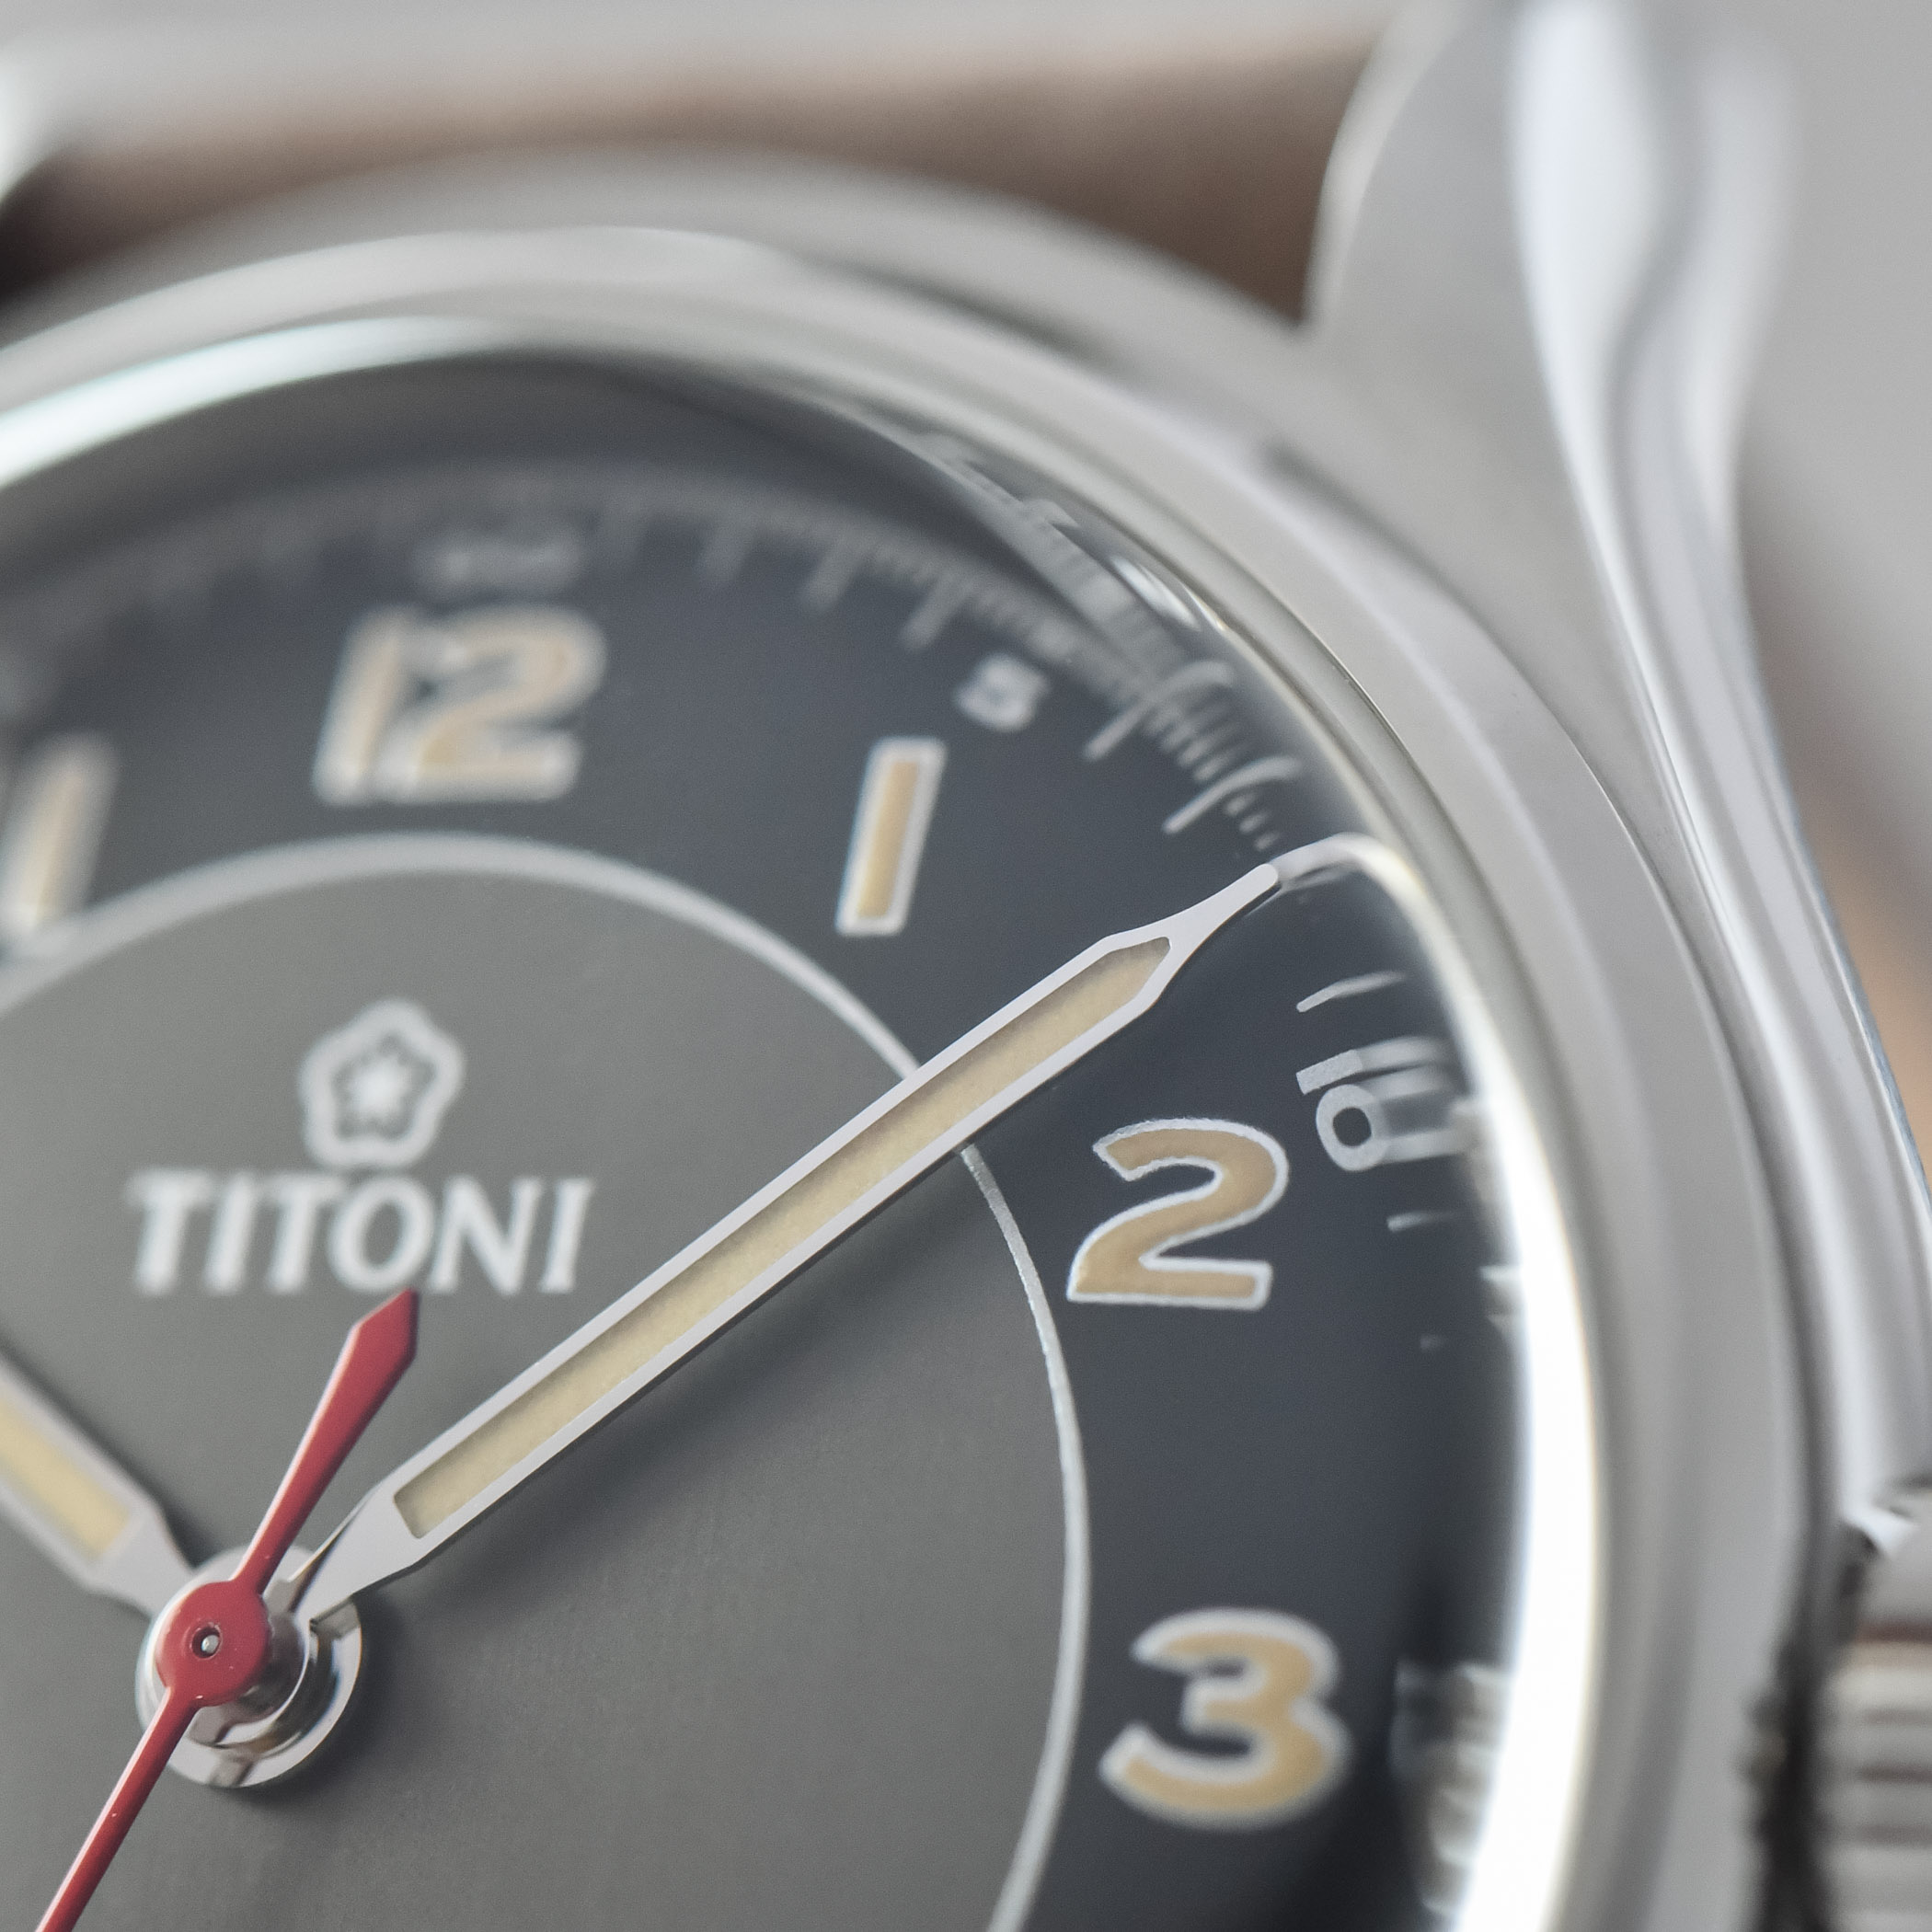 Titoni Heritage 83019